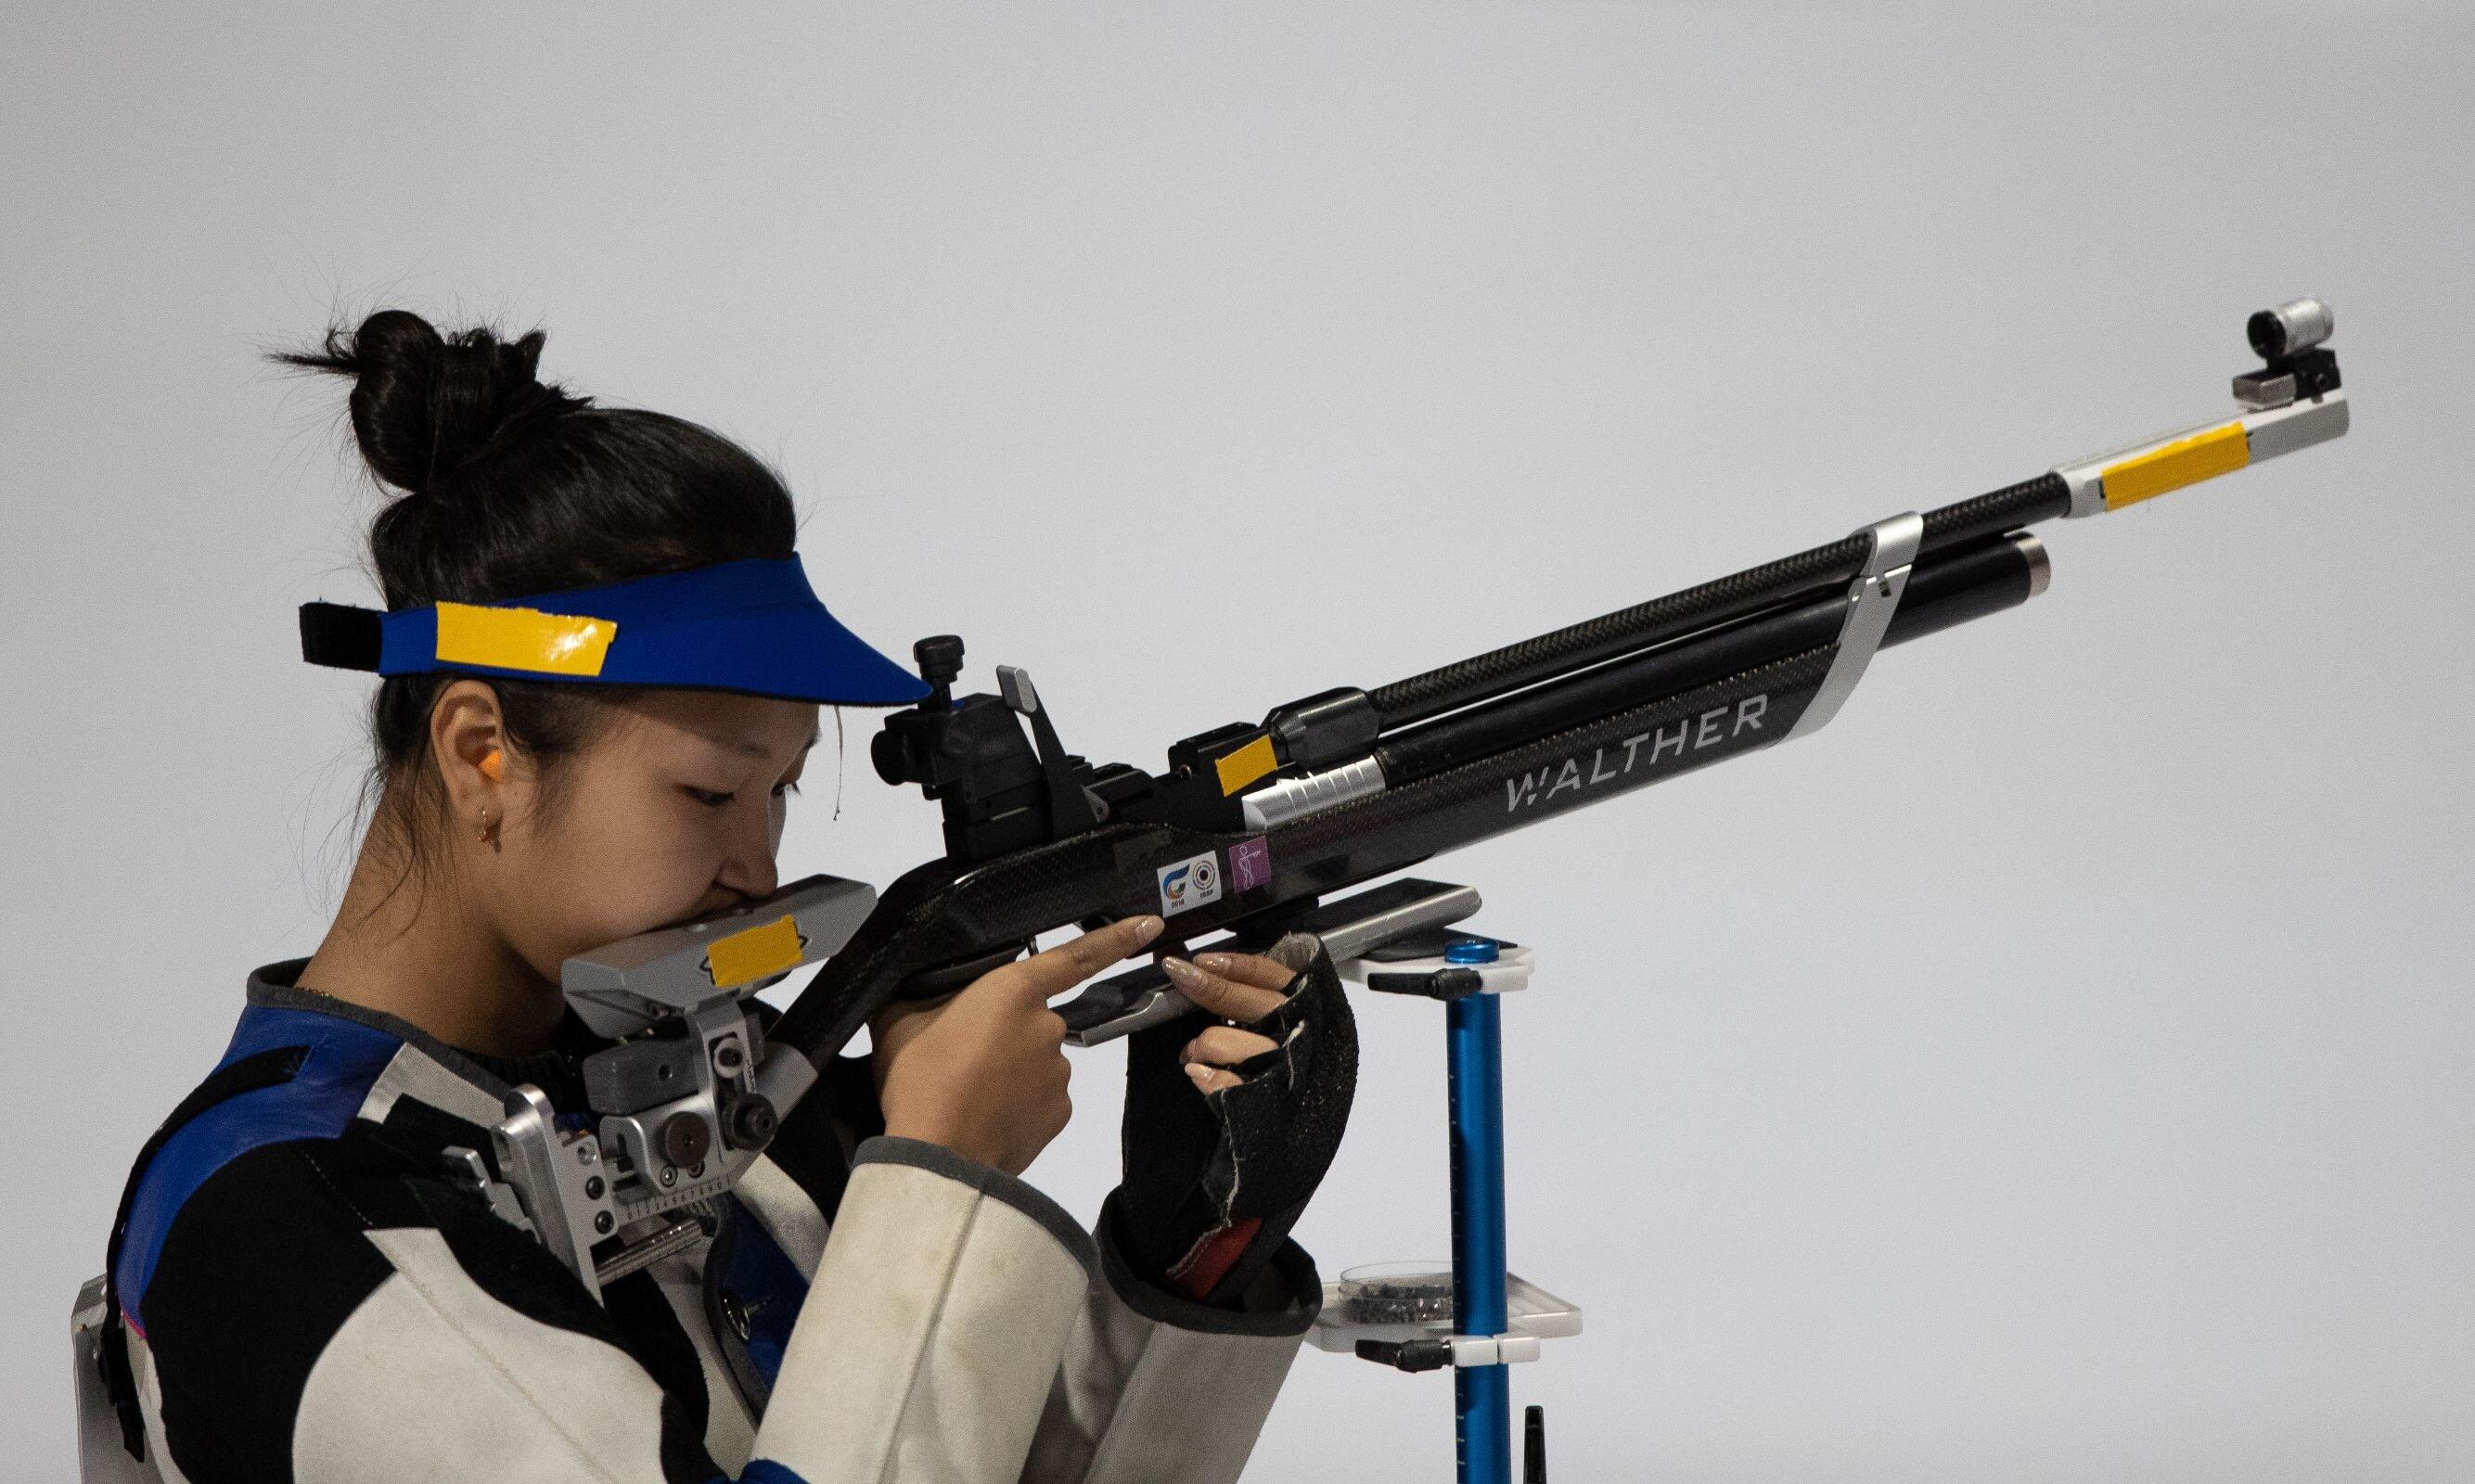 Buenos Aires 2018 - DanceSport - 10m Air Rifle Mixed International Team